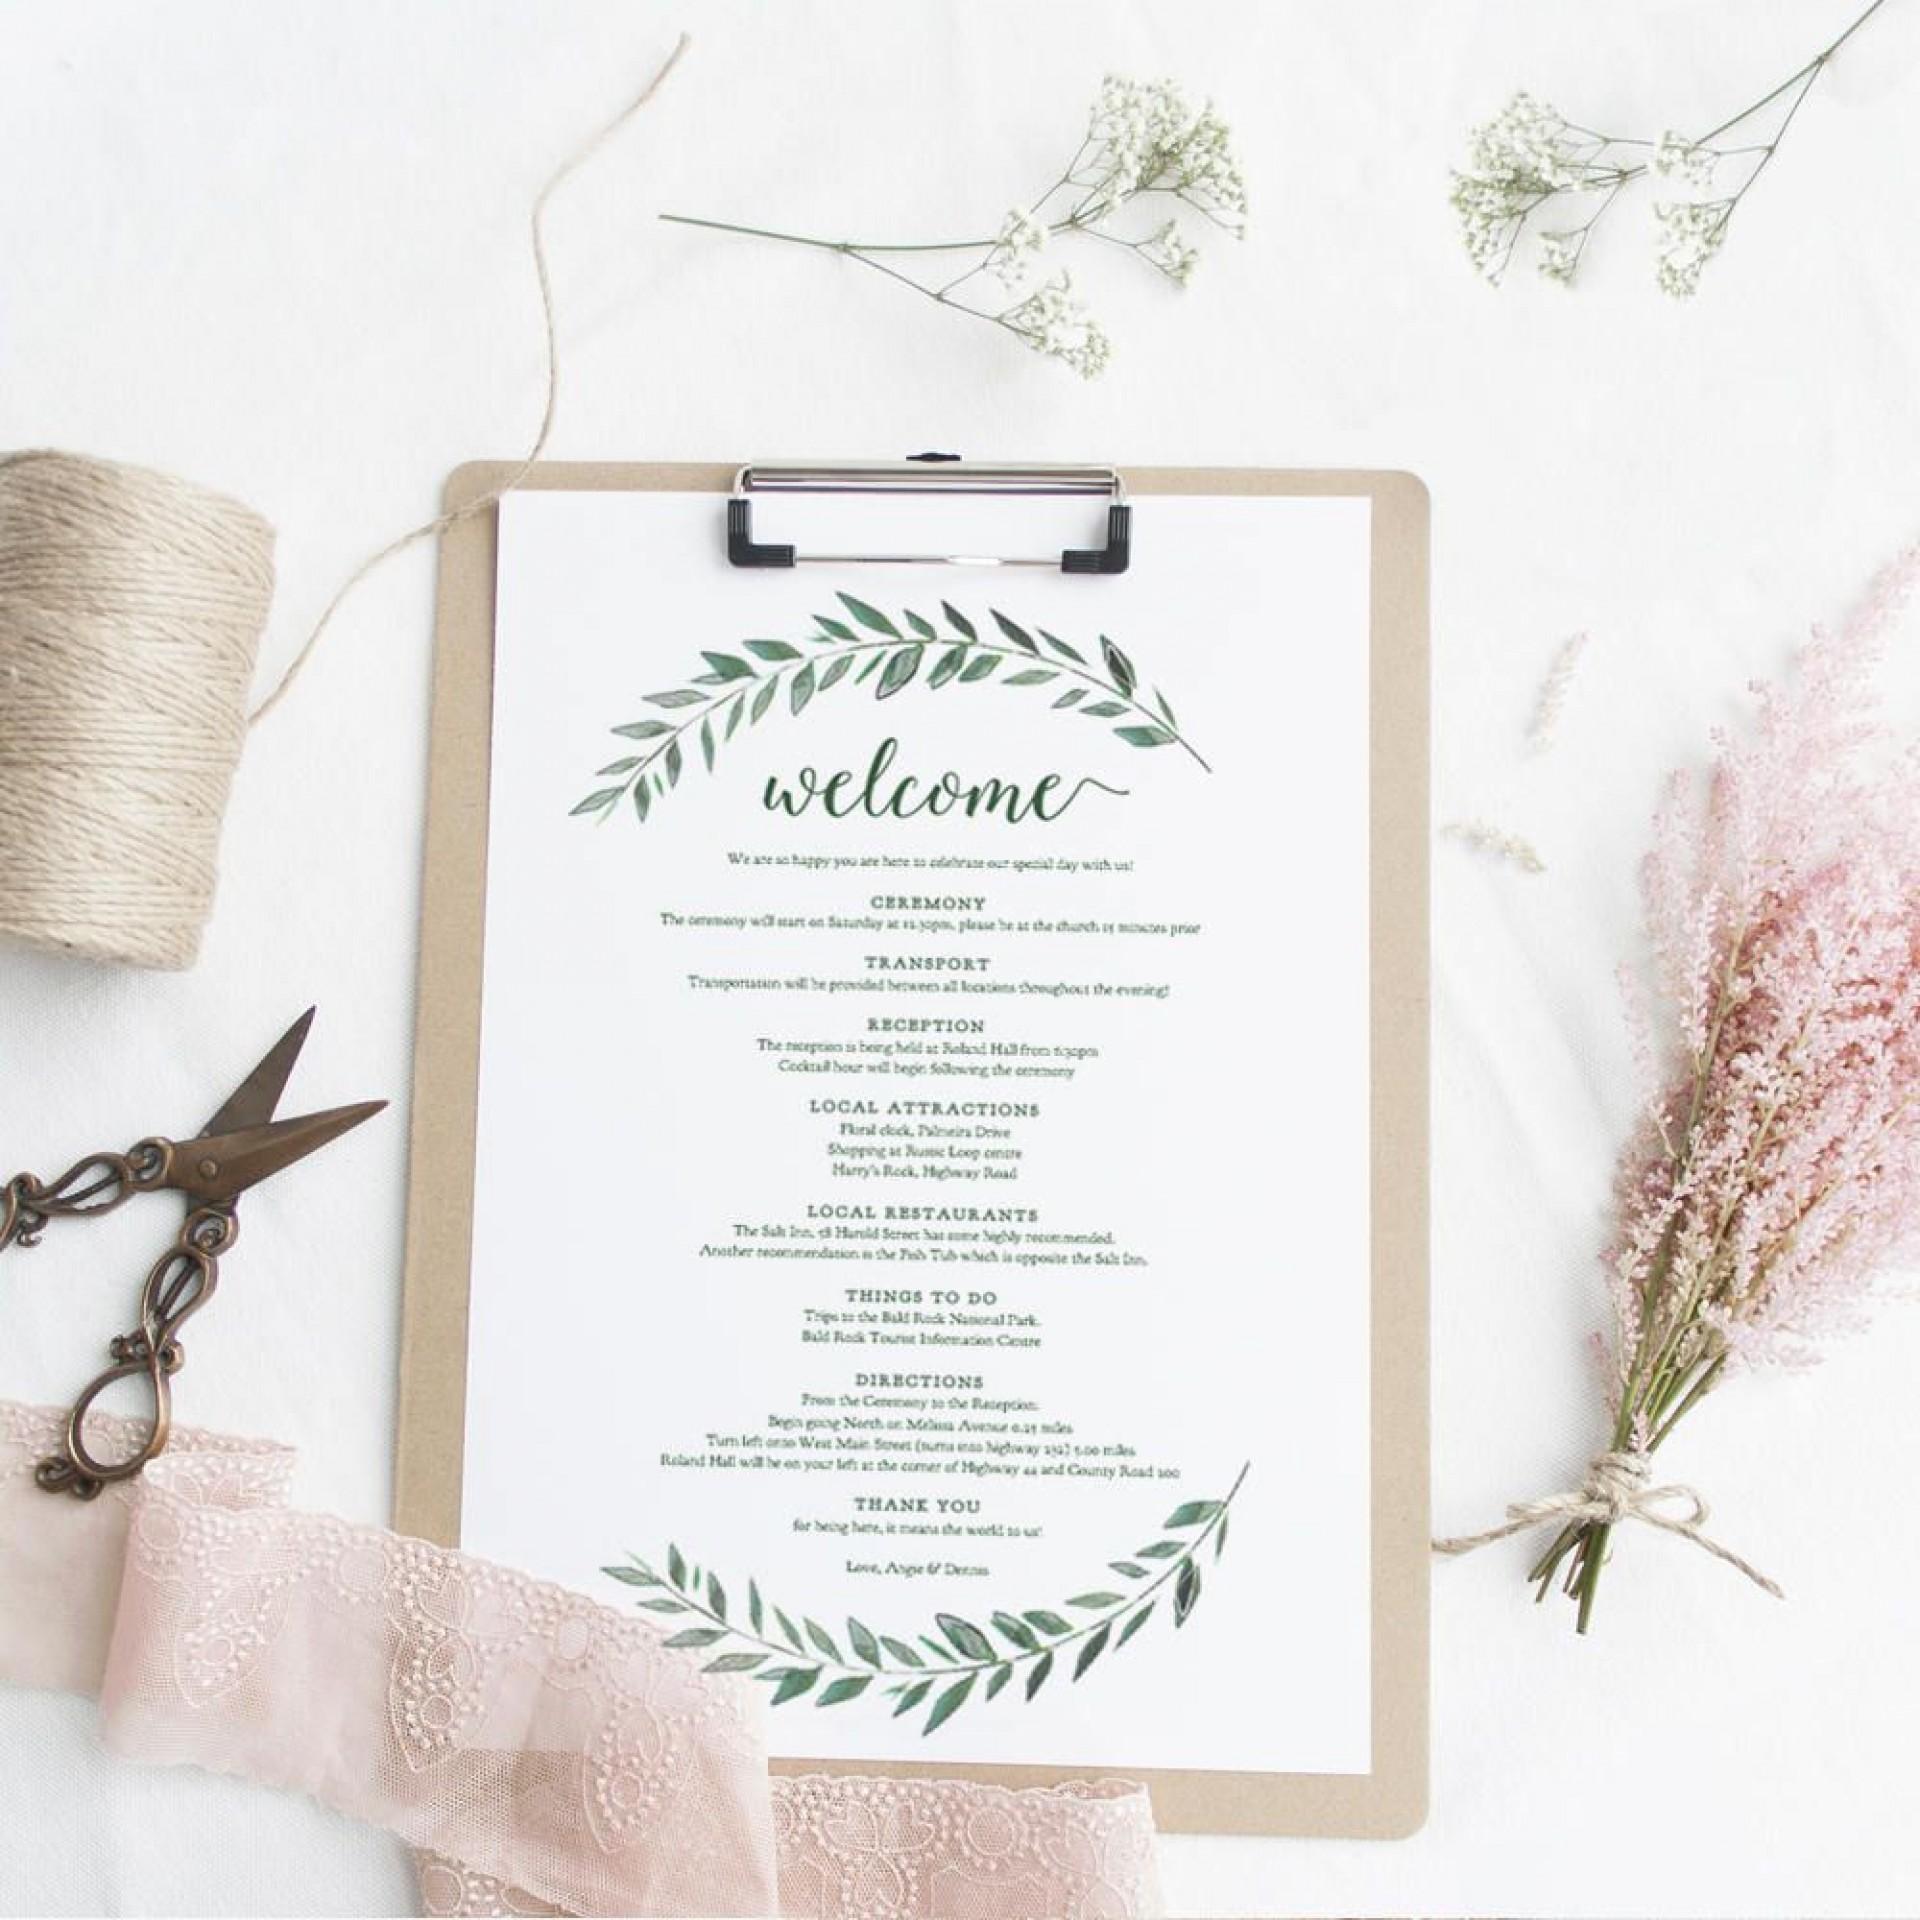 006 Singular Wedding Welcome Letter Template Free Highest Clarity  Bag1920